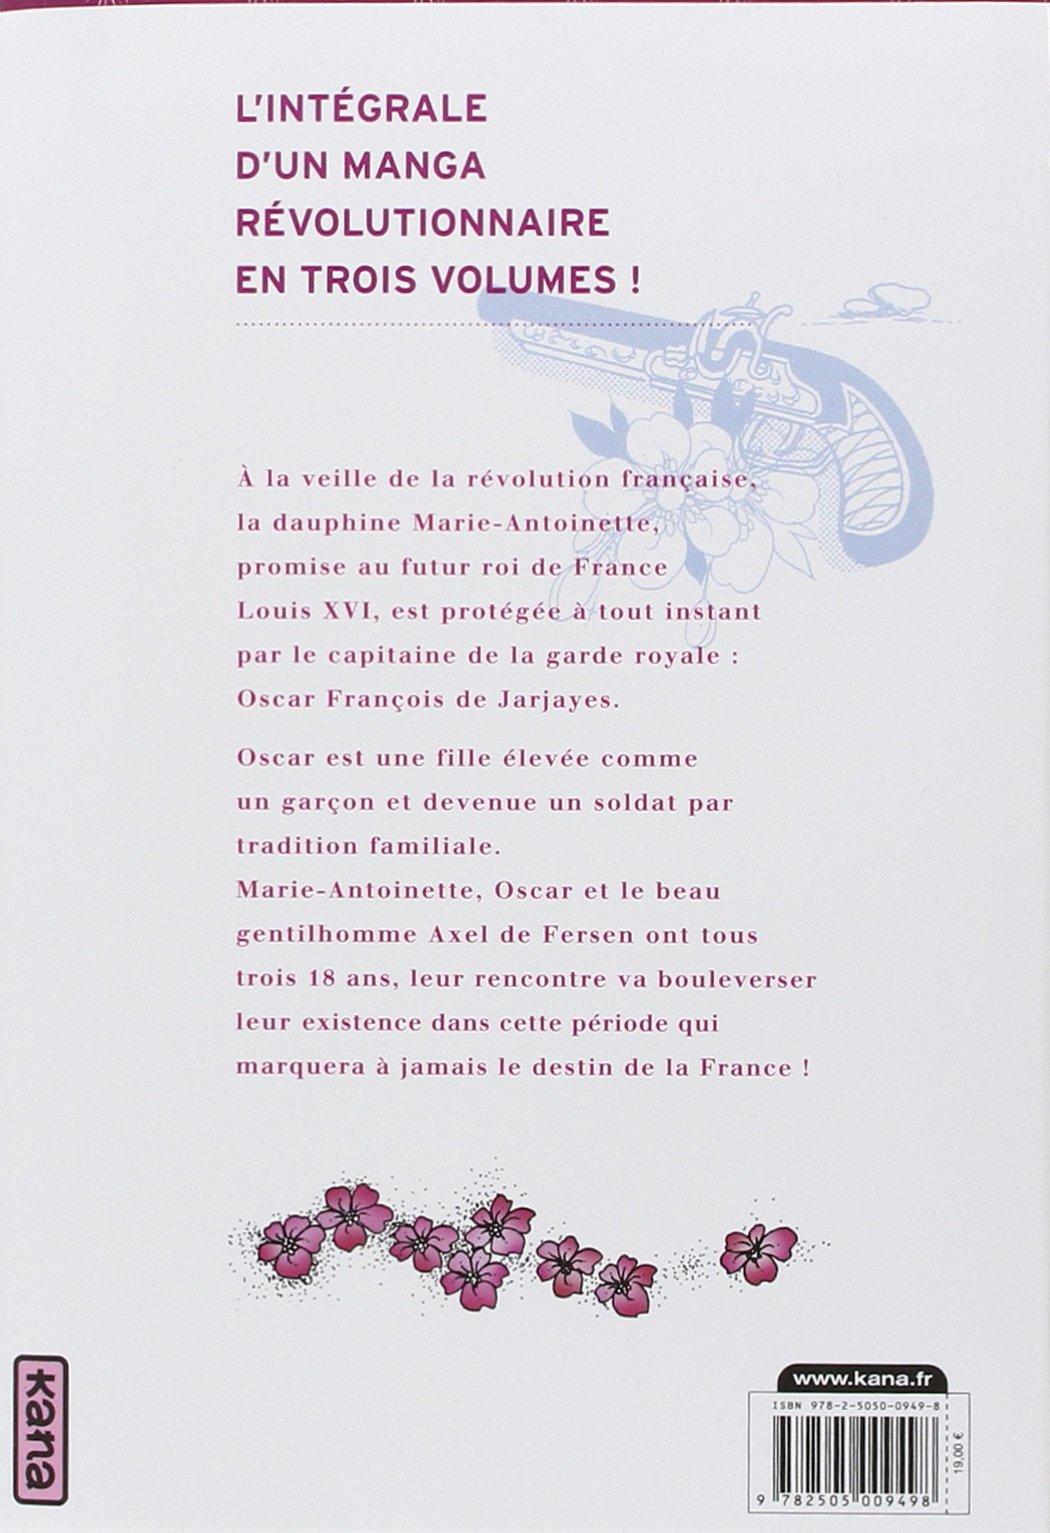 rose de versailles integrale 02